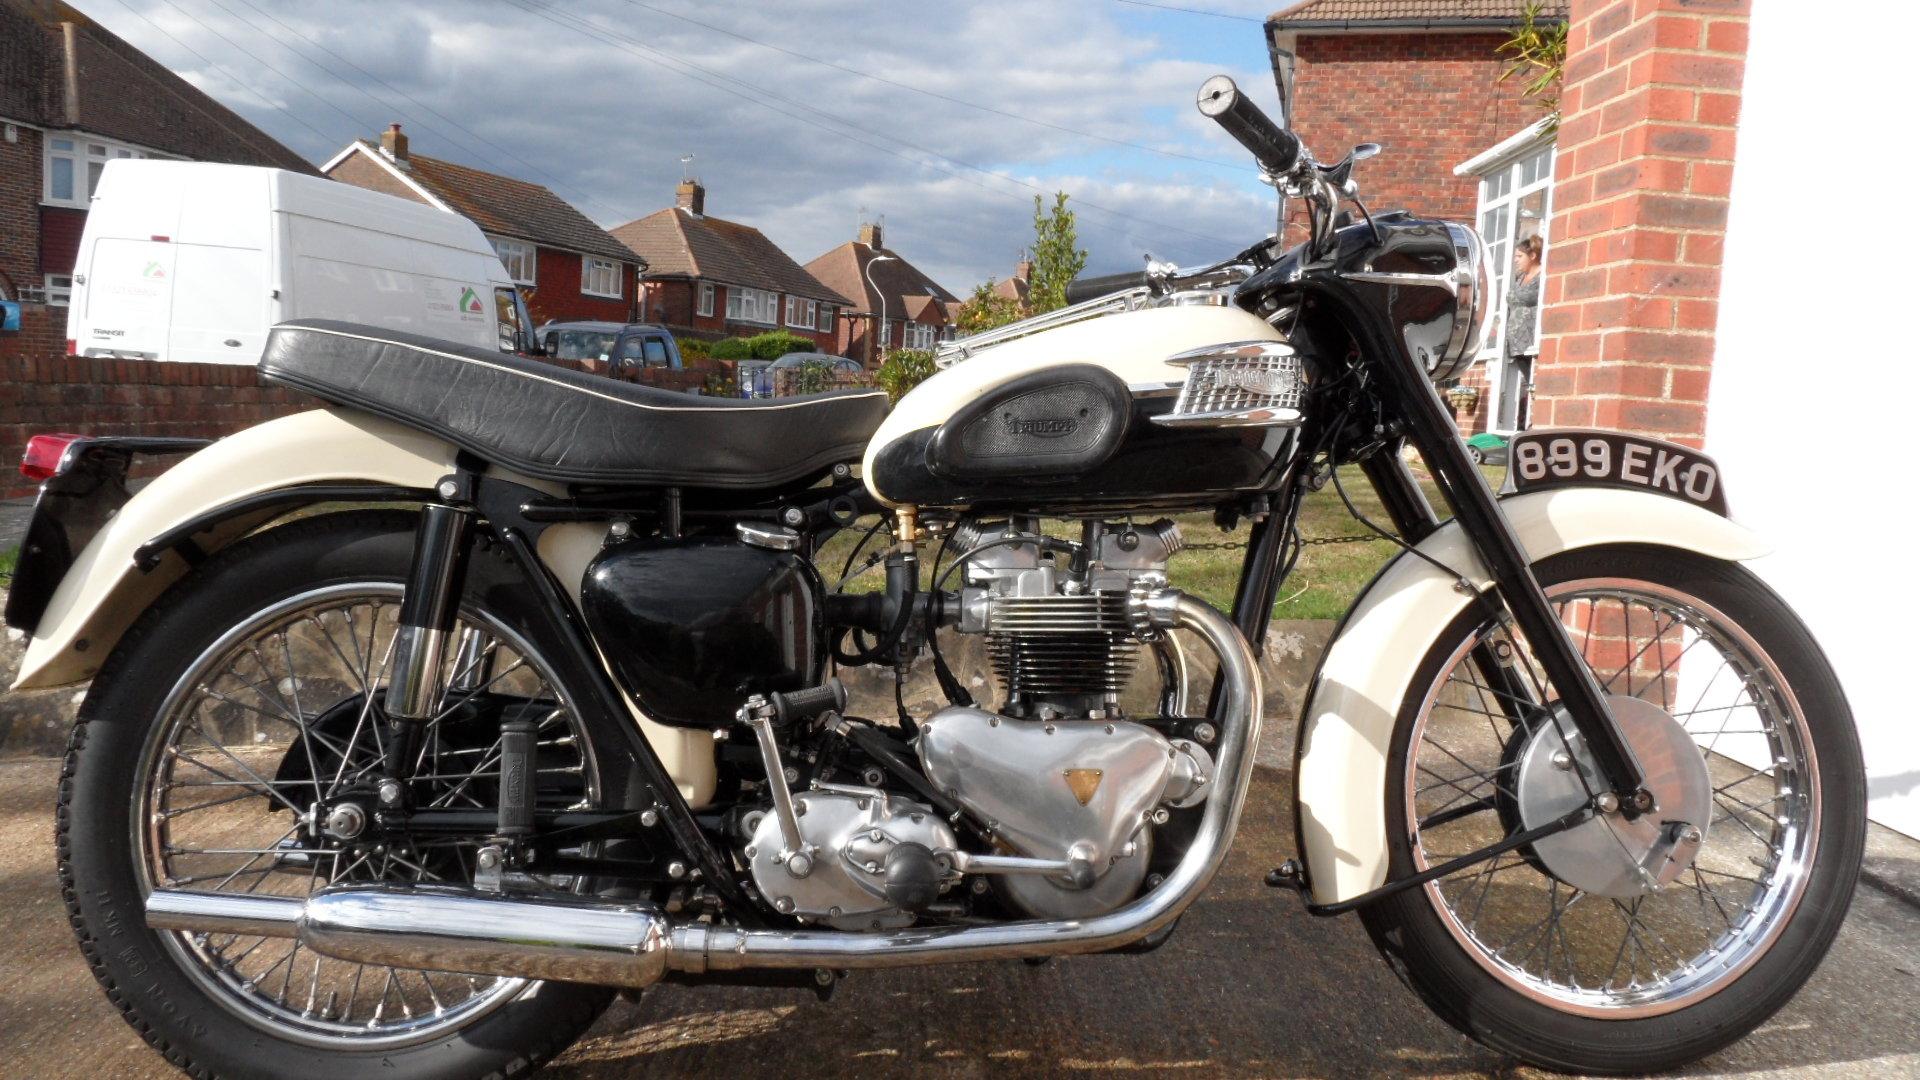 1959 Triumph Tiger T110 For Sale (picture 1 of 4)